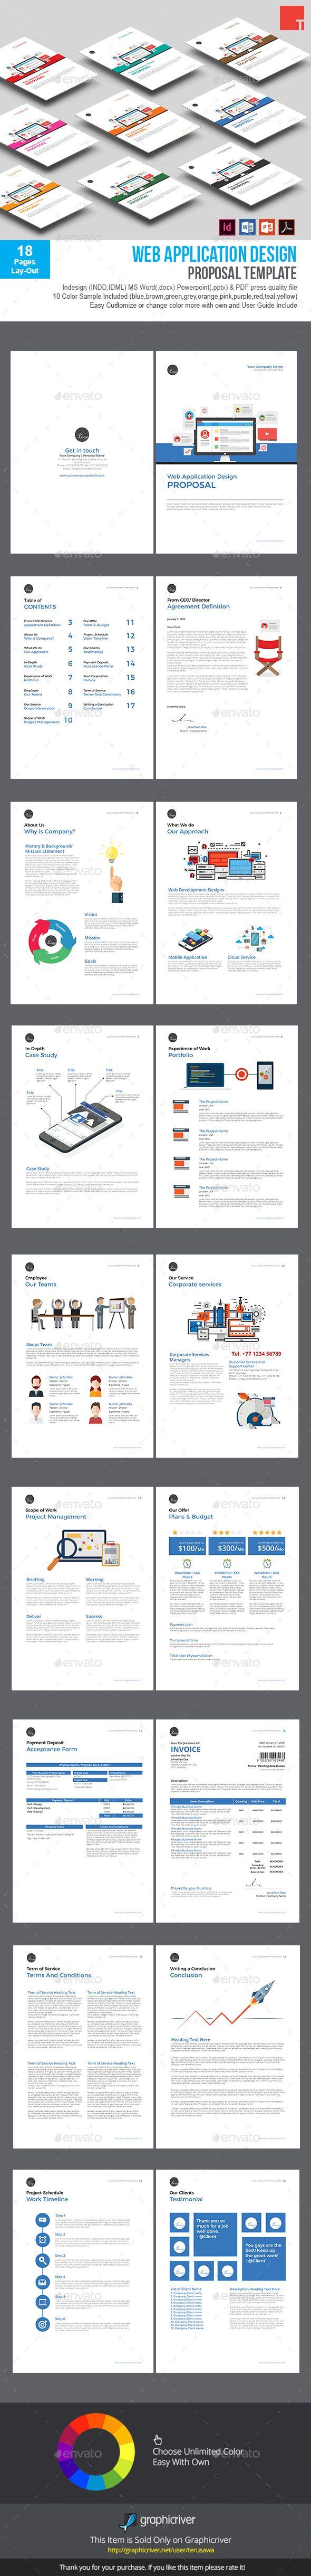 Web Application Design Proposal Template — InDesign INDD #creative ...